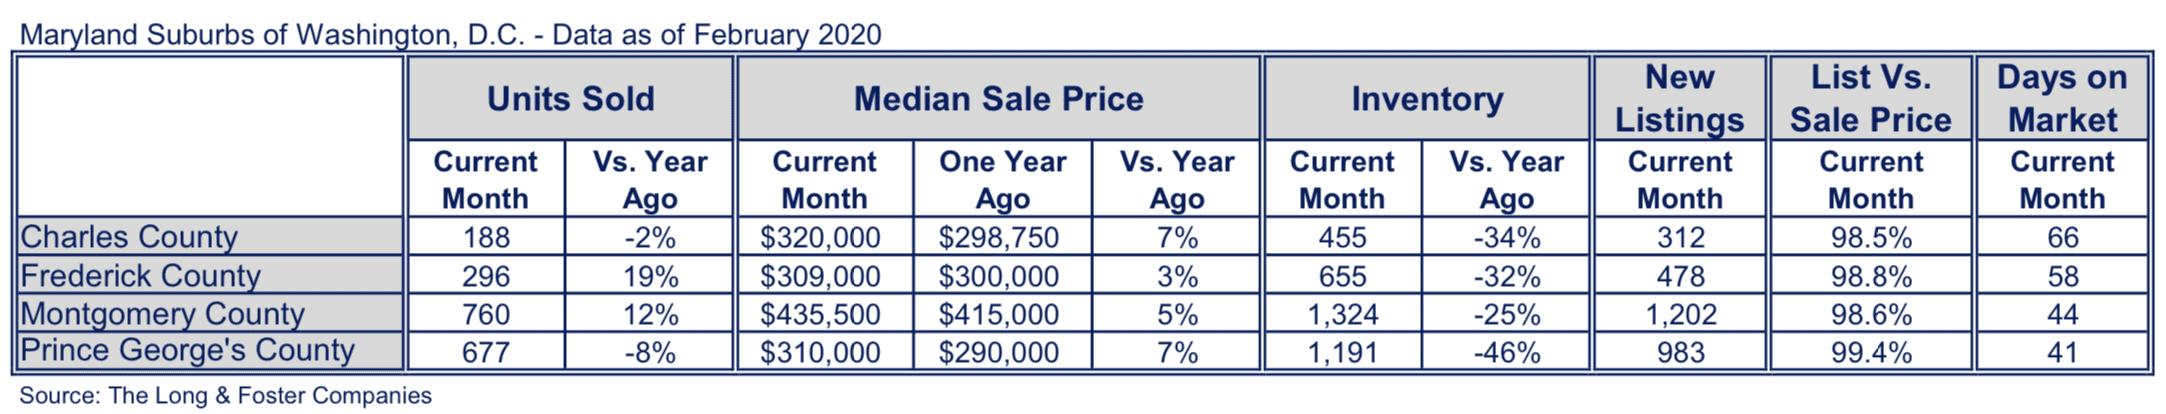 Maryland Suburbs Market Minute Chart February 2020